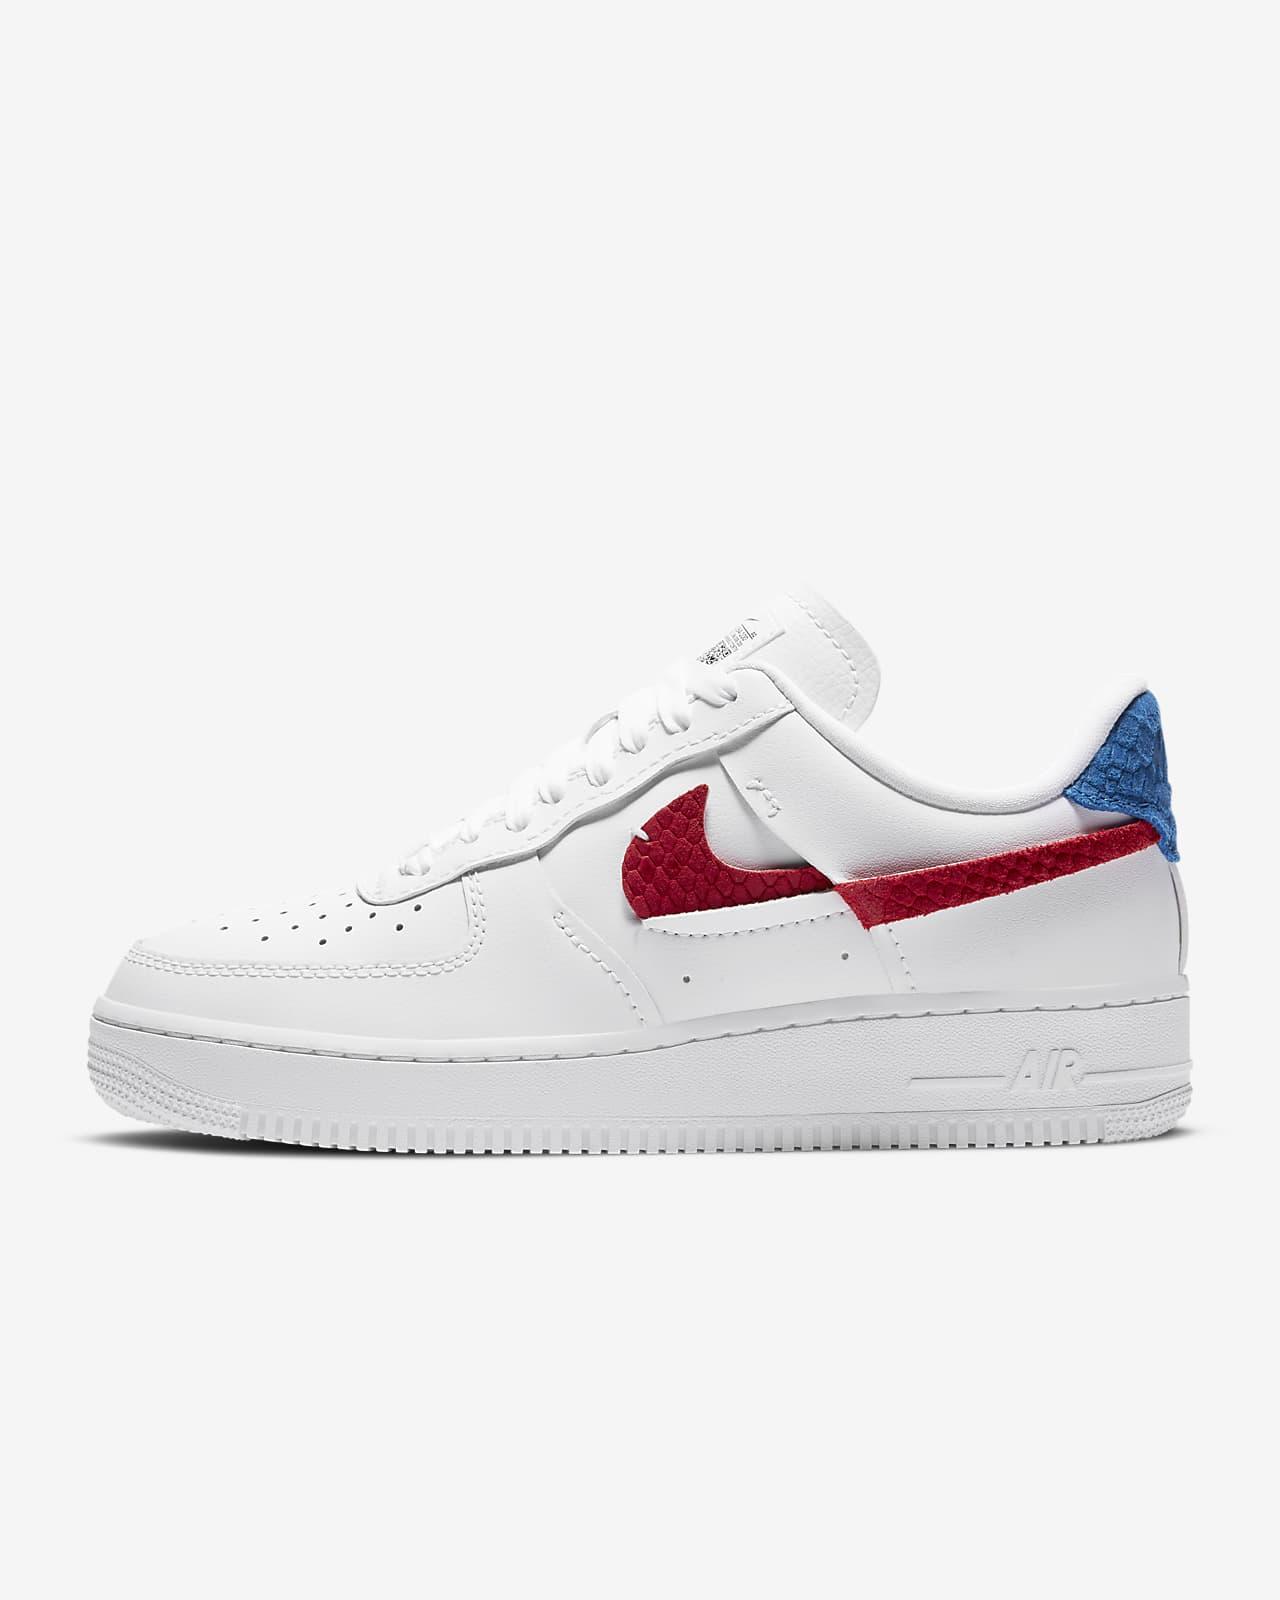 Dámská bota Nike Air Force 1 LXX